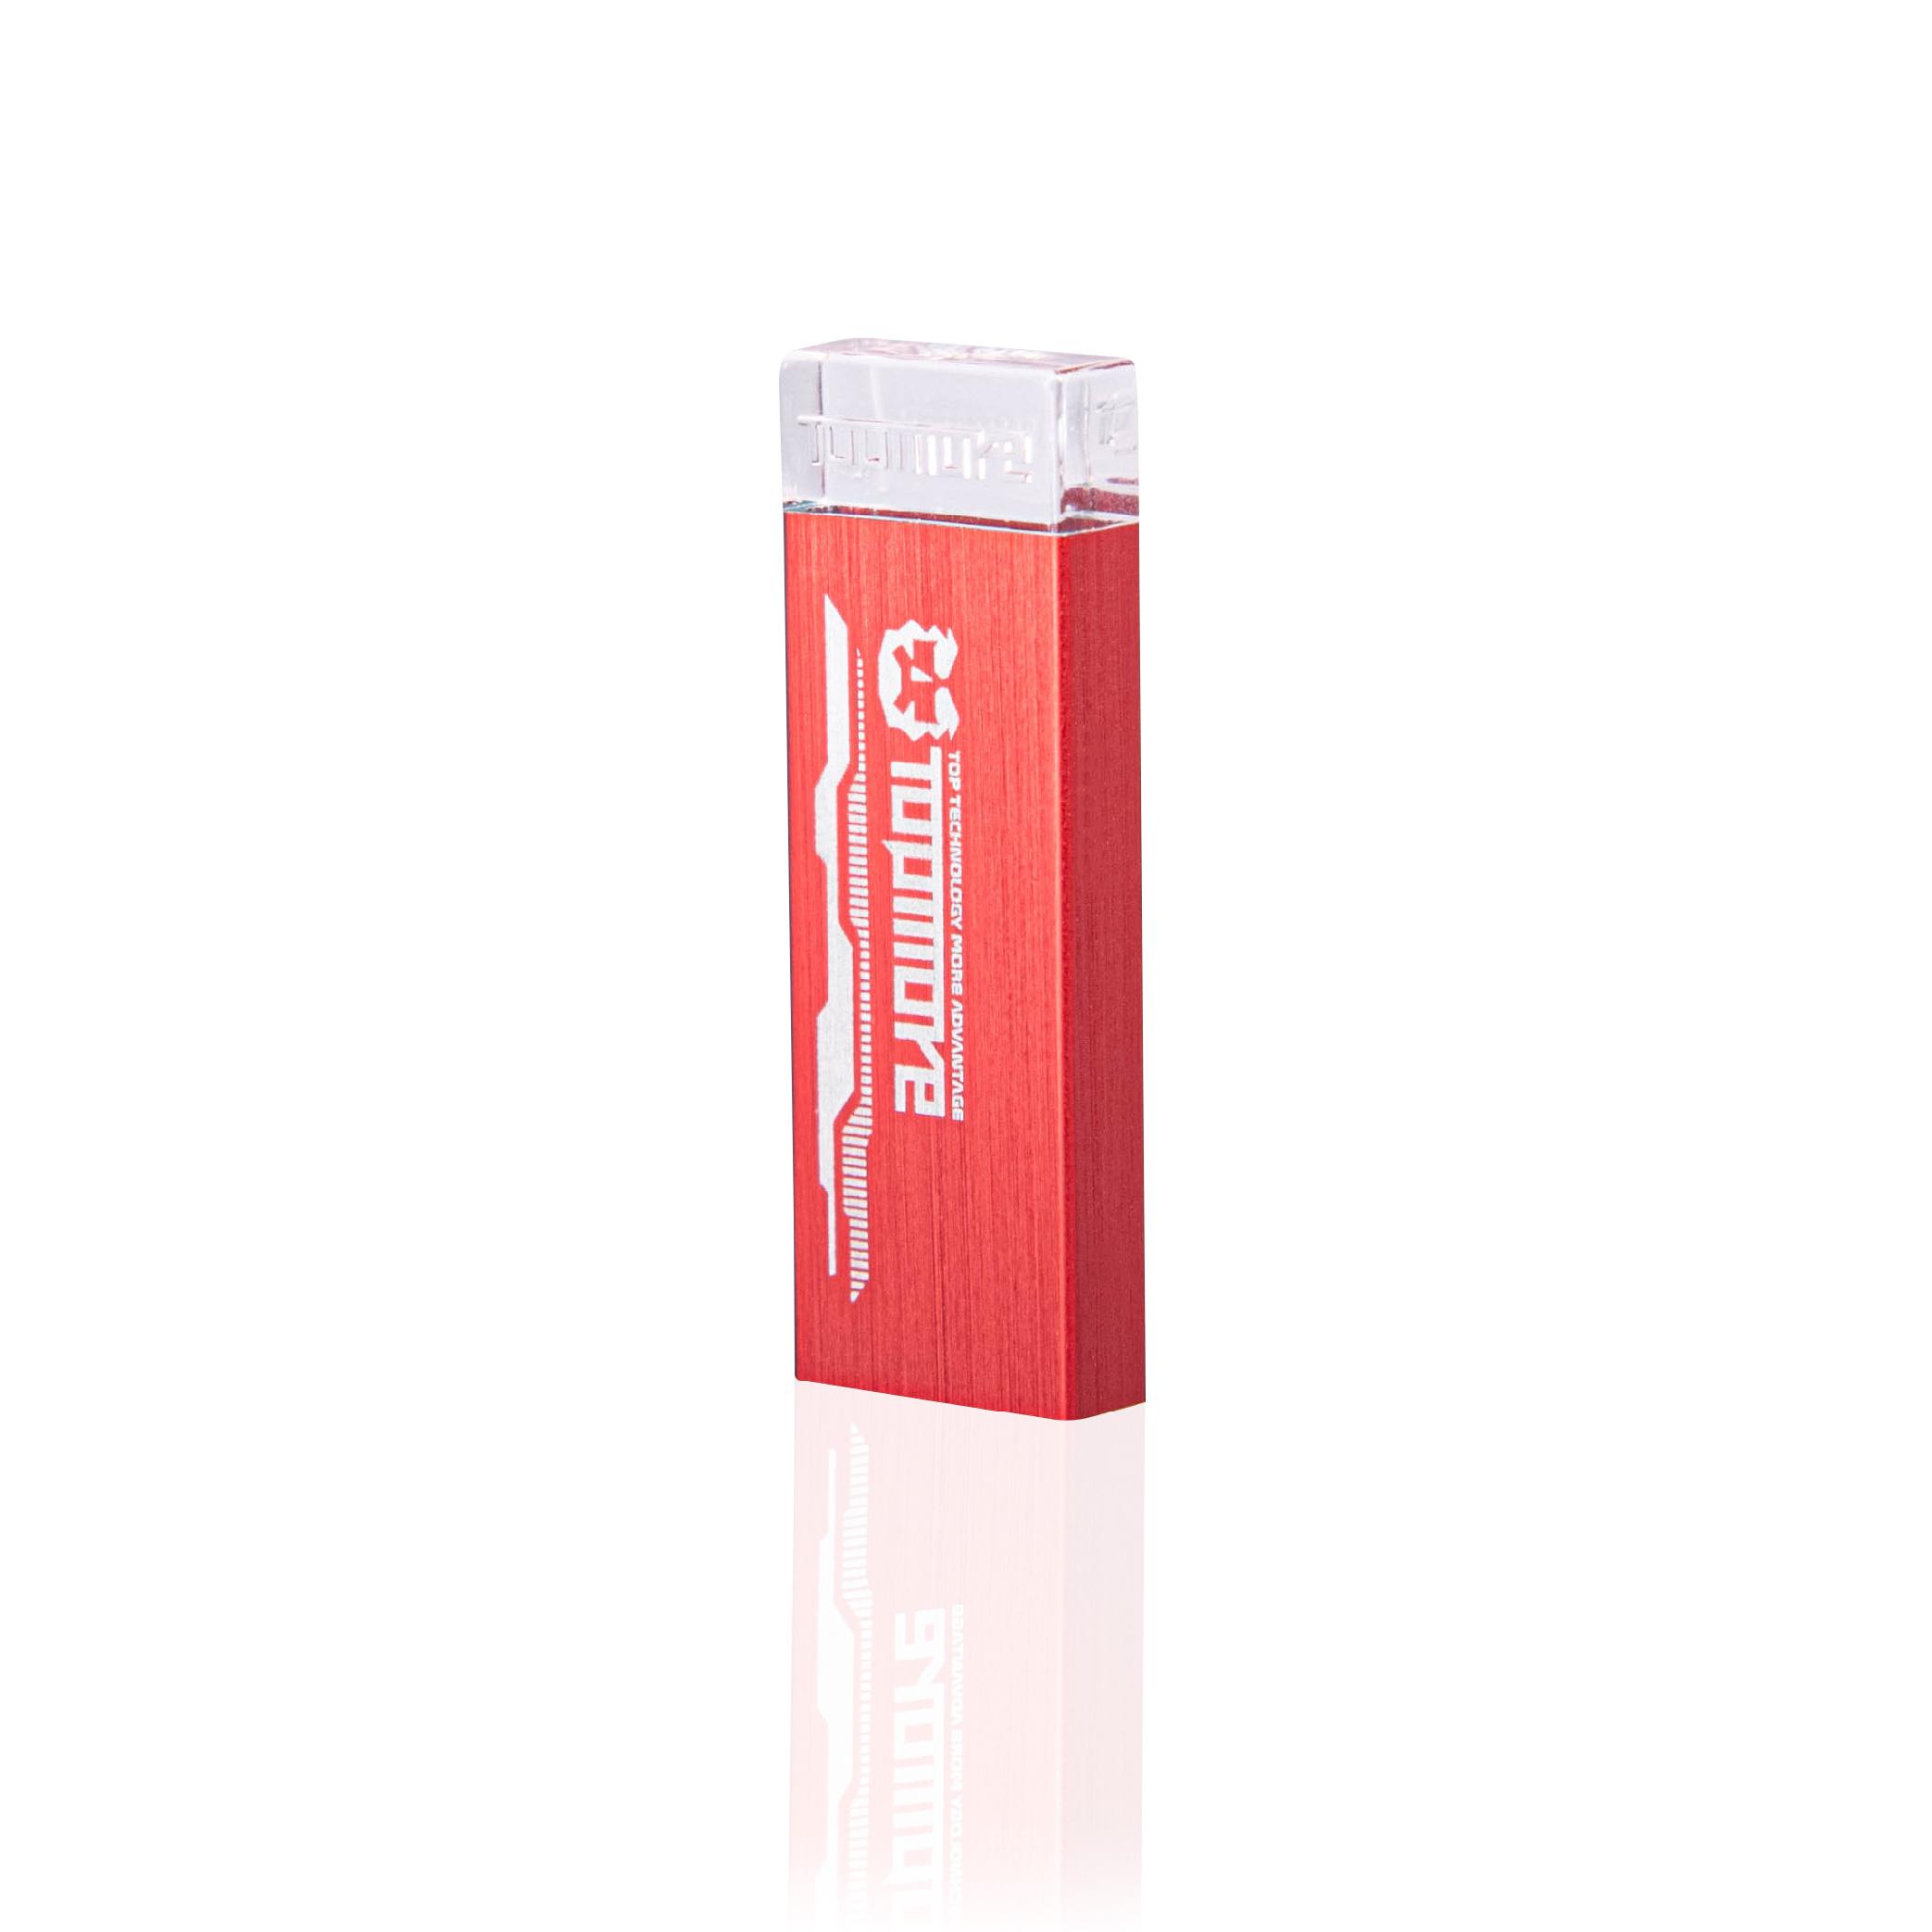 Topmore 達墨系列AI發光隨身碟 USB3.0 32GB-紅色